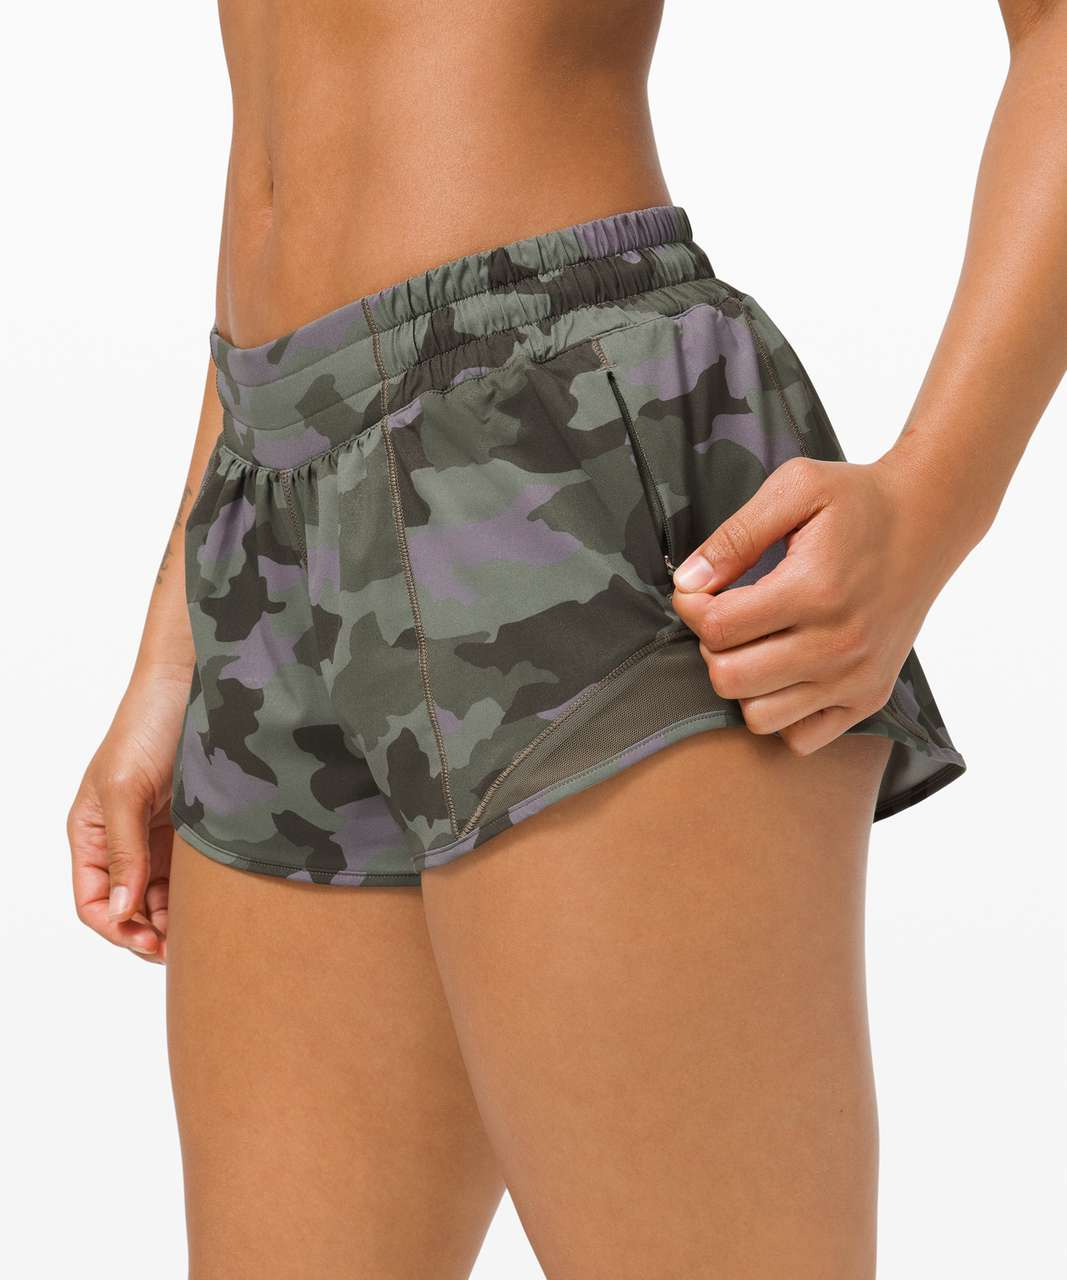 "Lululemon Hotty Hot Short II *2.5"" - Heritage 365 Camo Dusky Lavender Multi / Army Green"